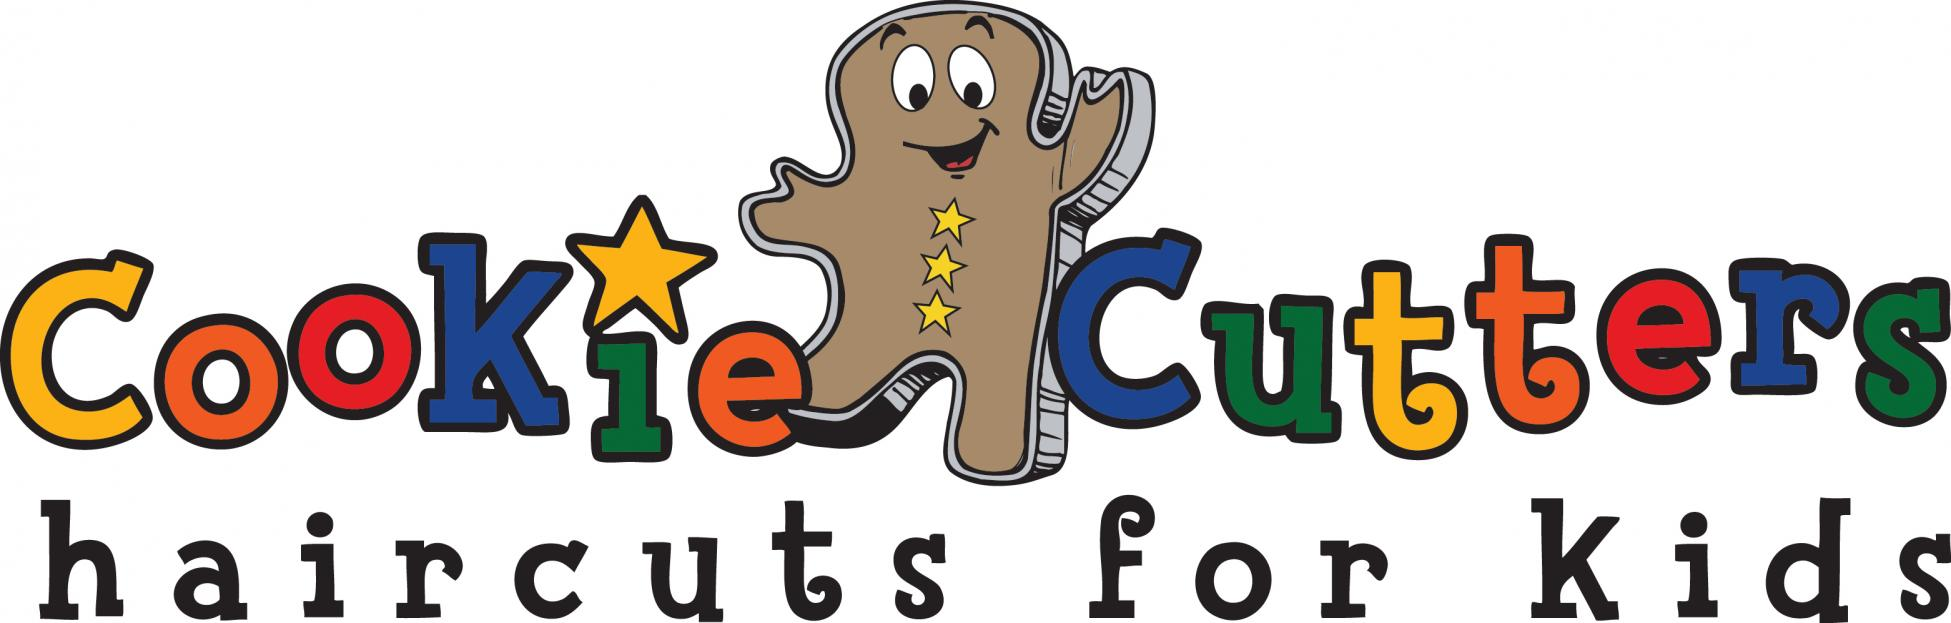 Z. Cougar News/horizontal logo.jpg